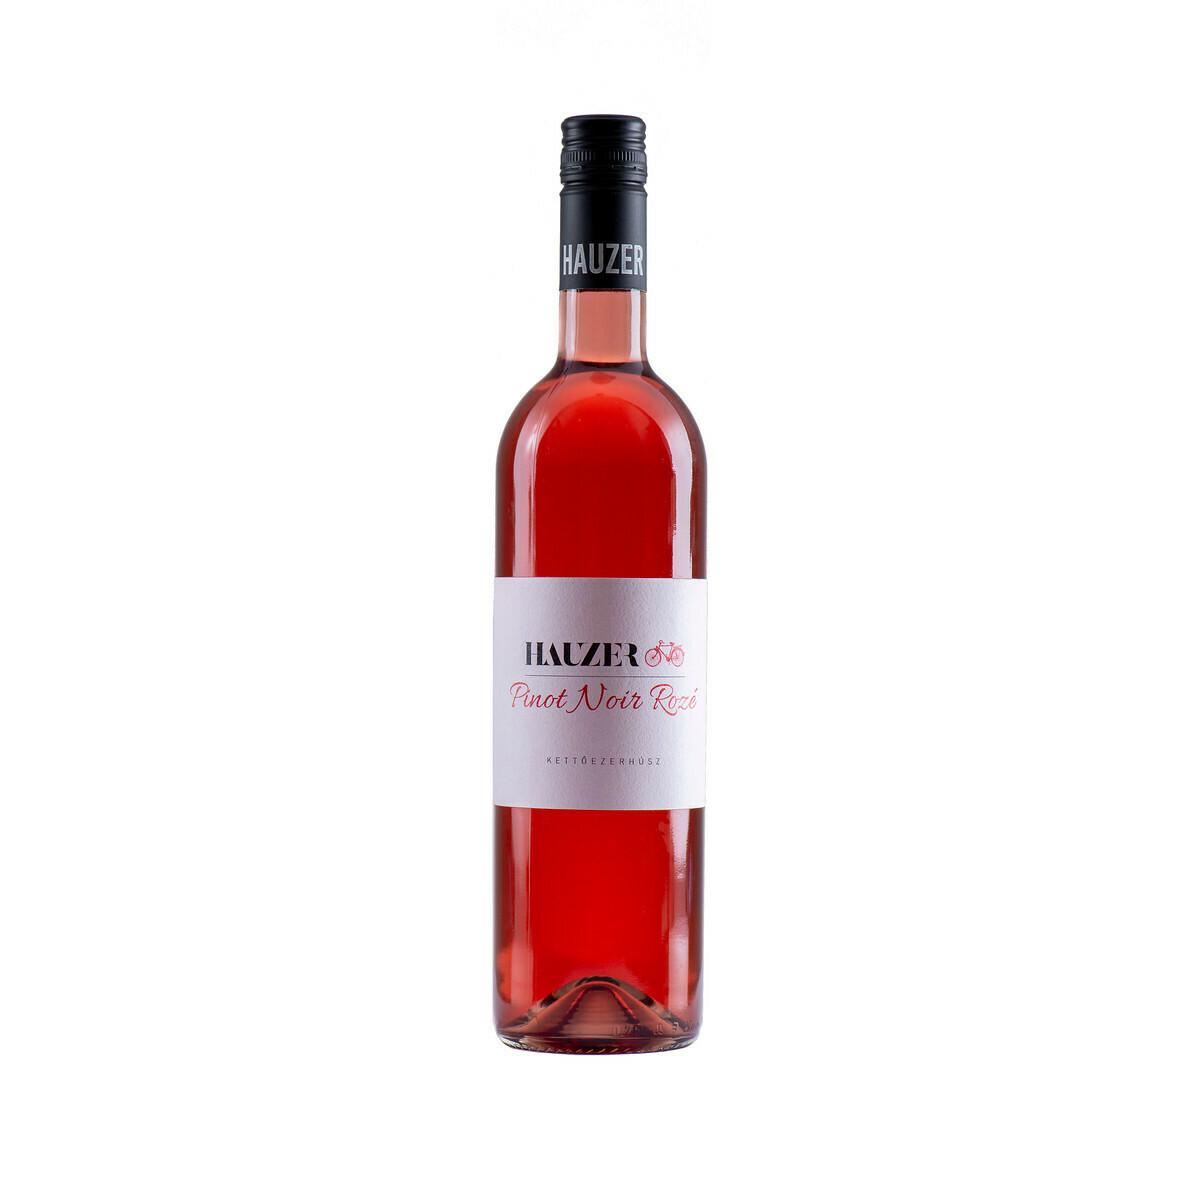 Pinot Noir rozé 2020